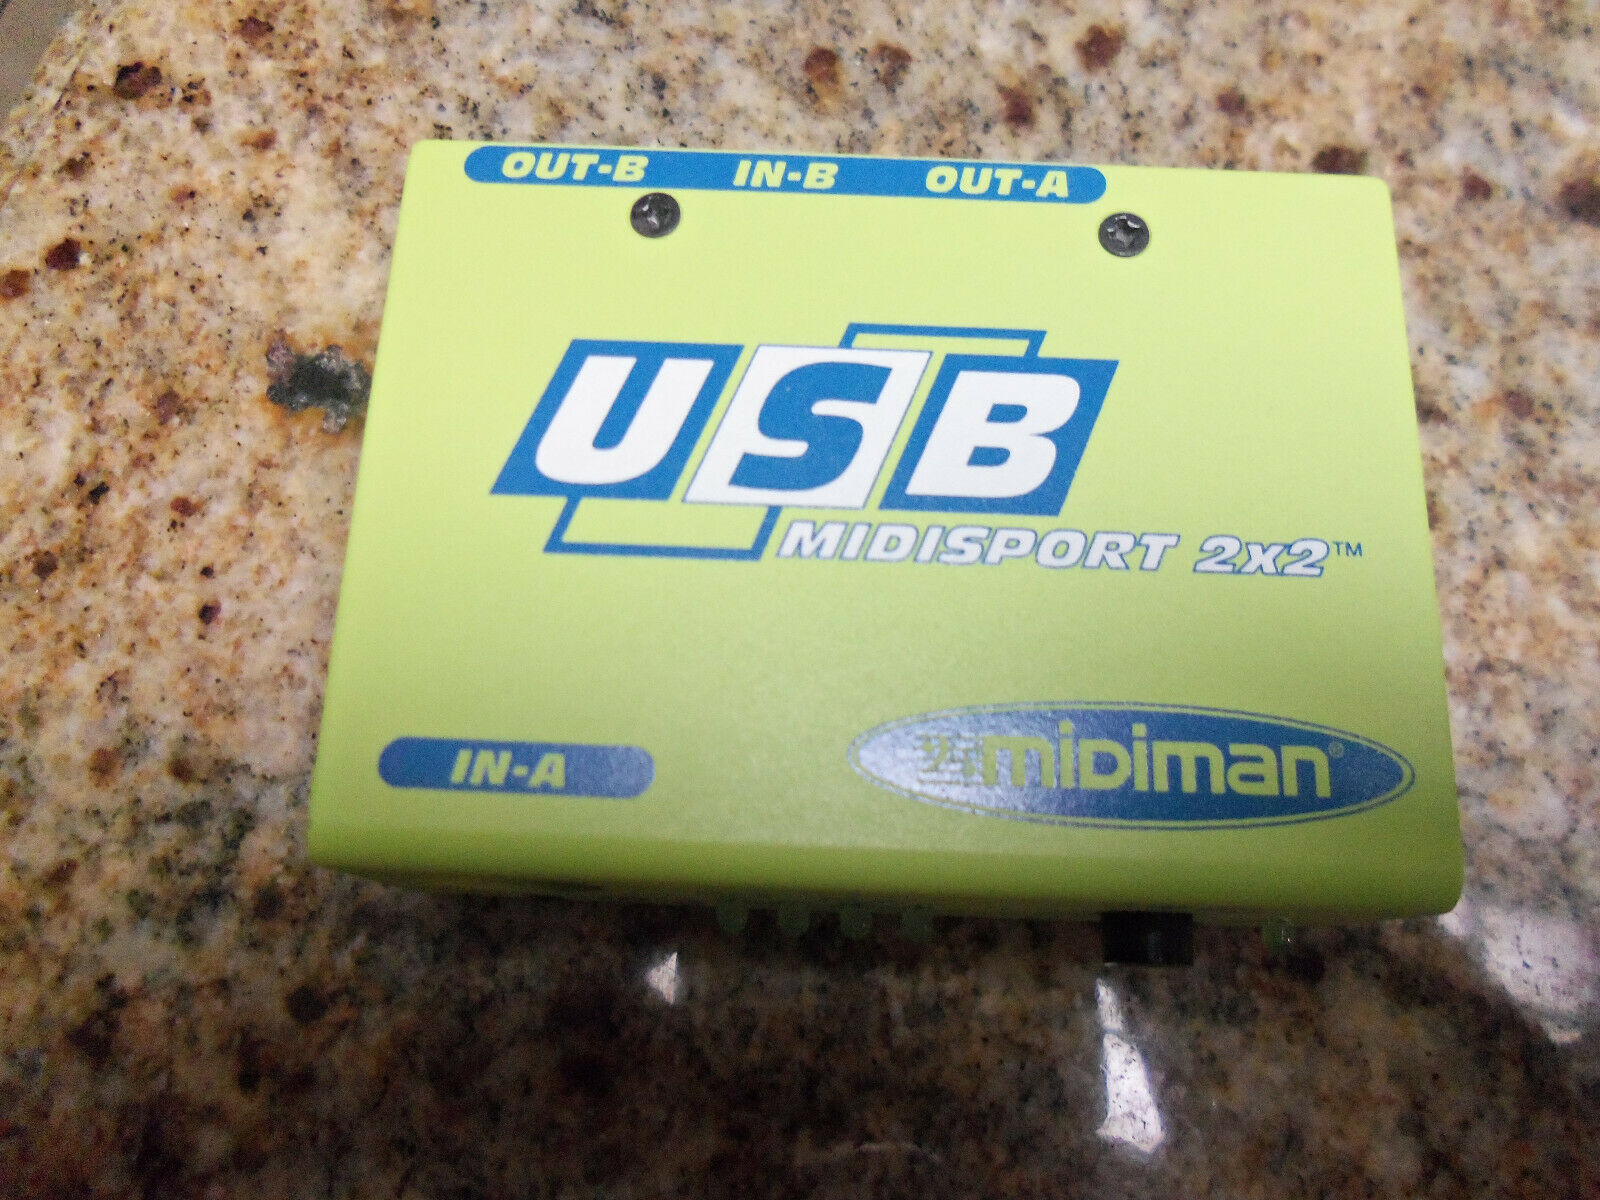 M-Audio Midiman Usb Midisport 2x2 Midi Interface - $14.99